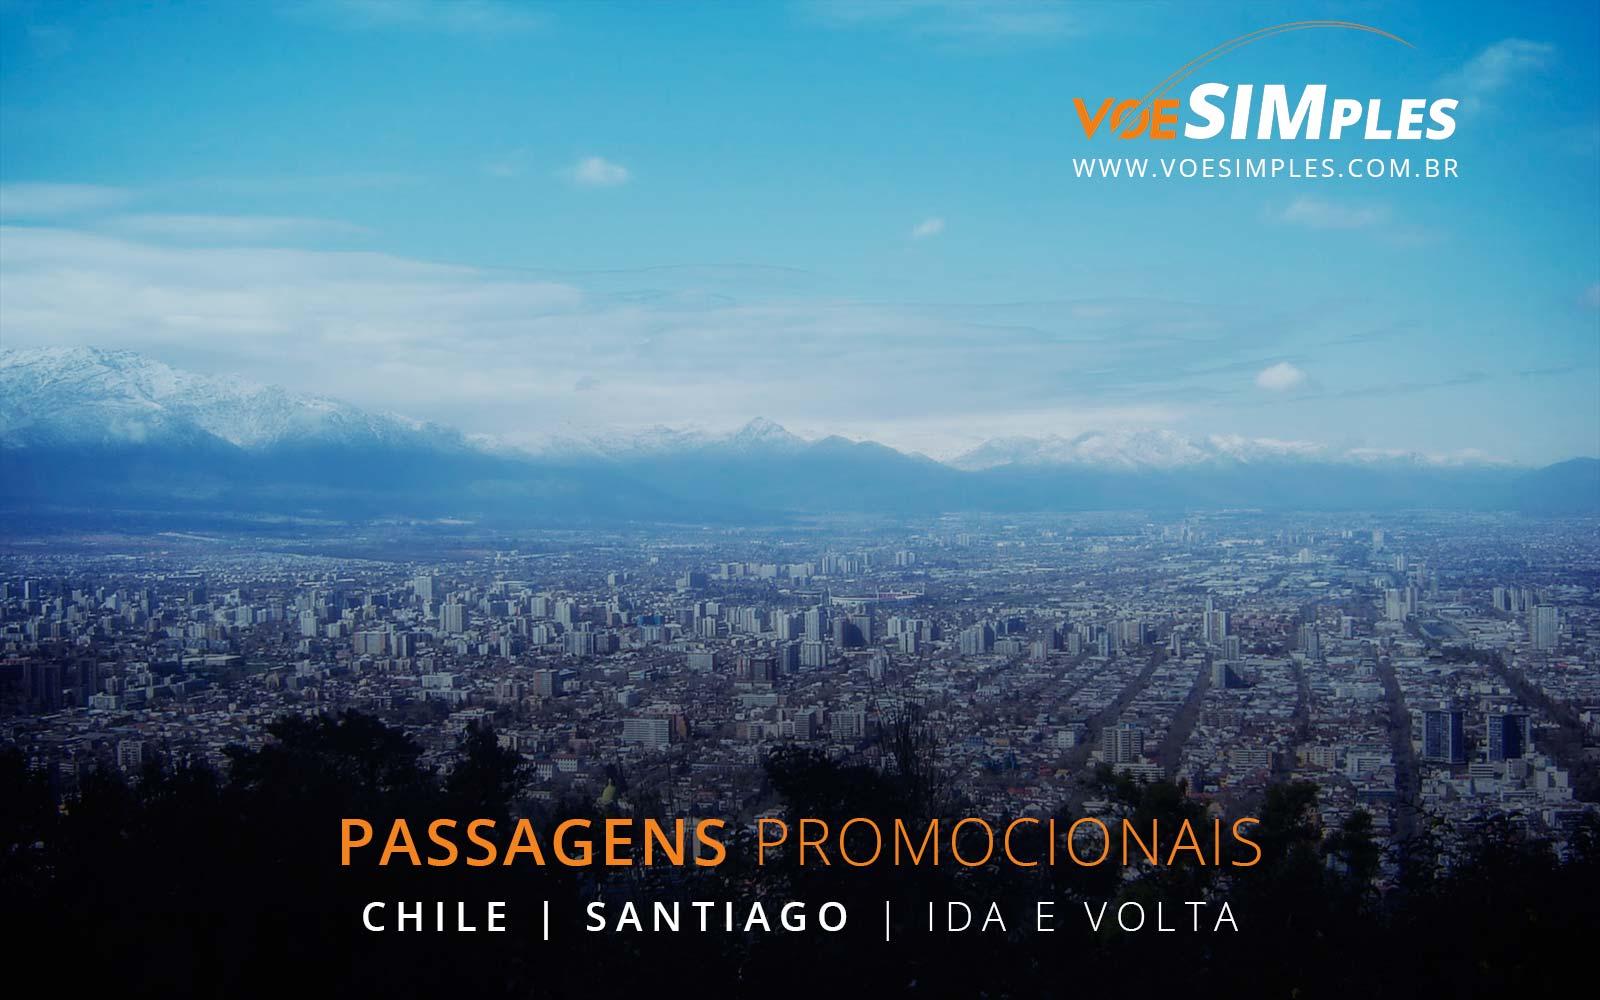 Passagens aéreas baratas para Santiago no Chile